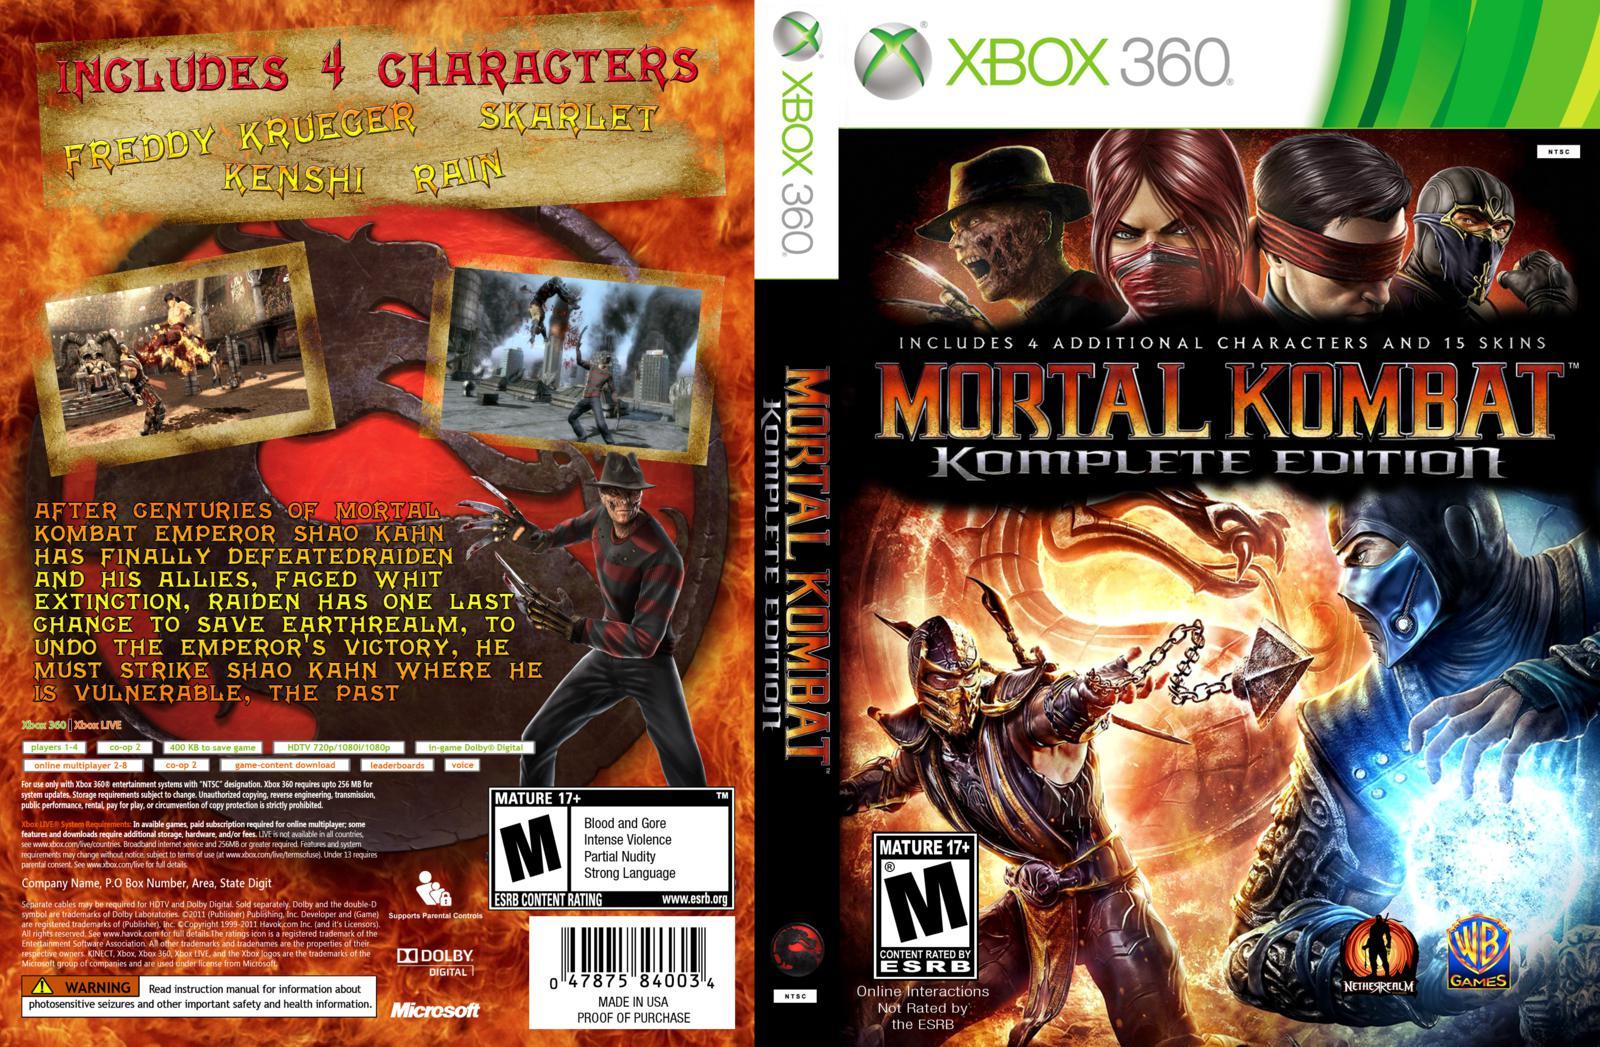 Mortal kombat komplete edition nudity adult comics